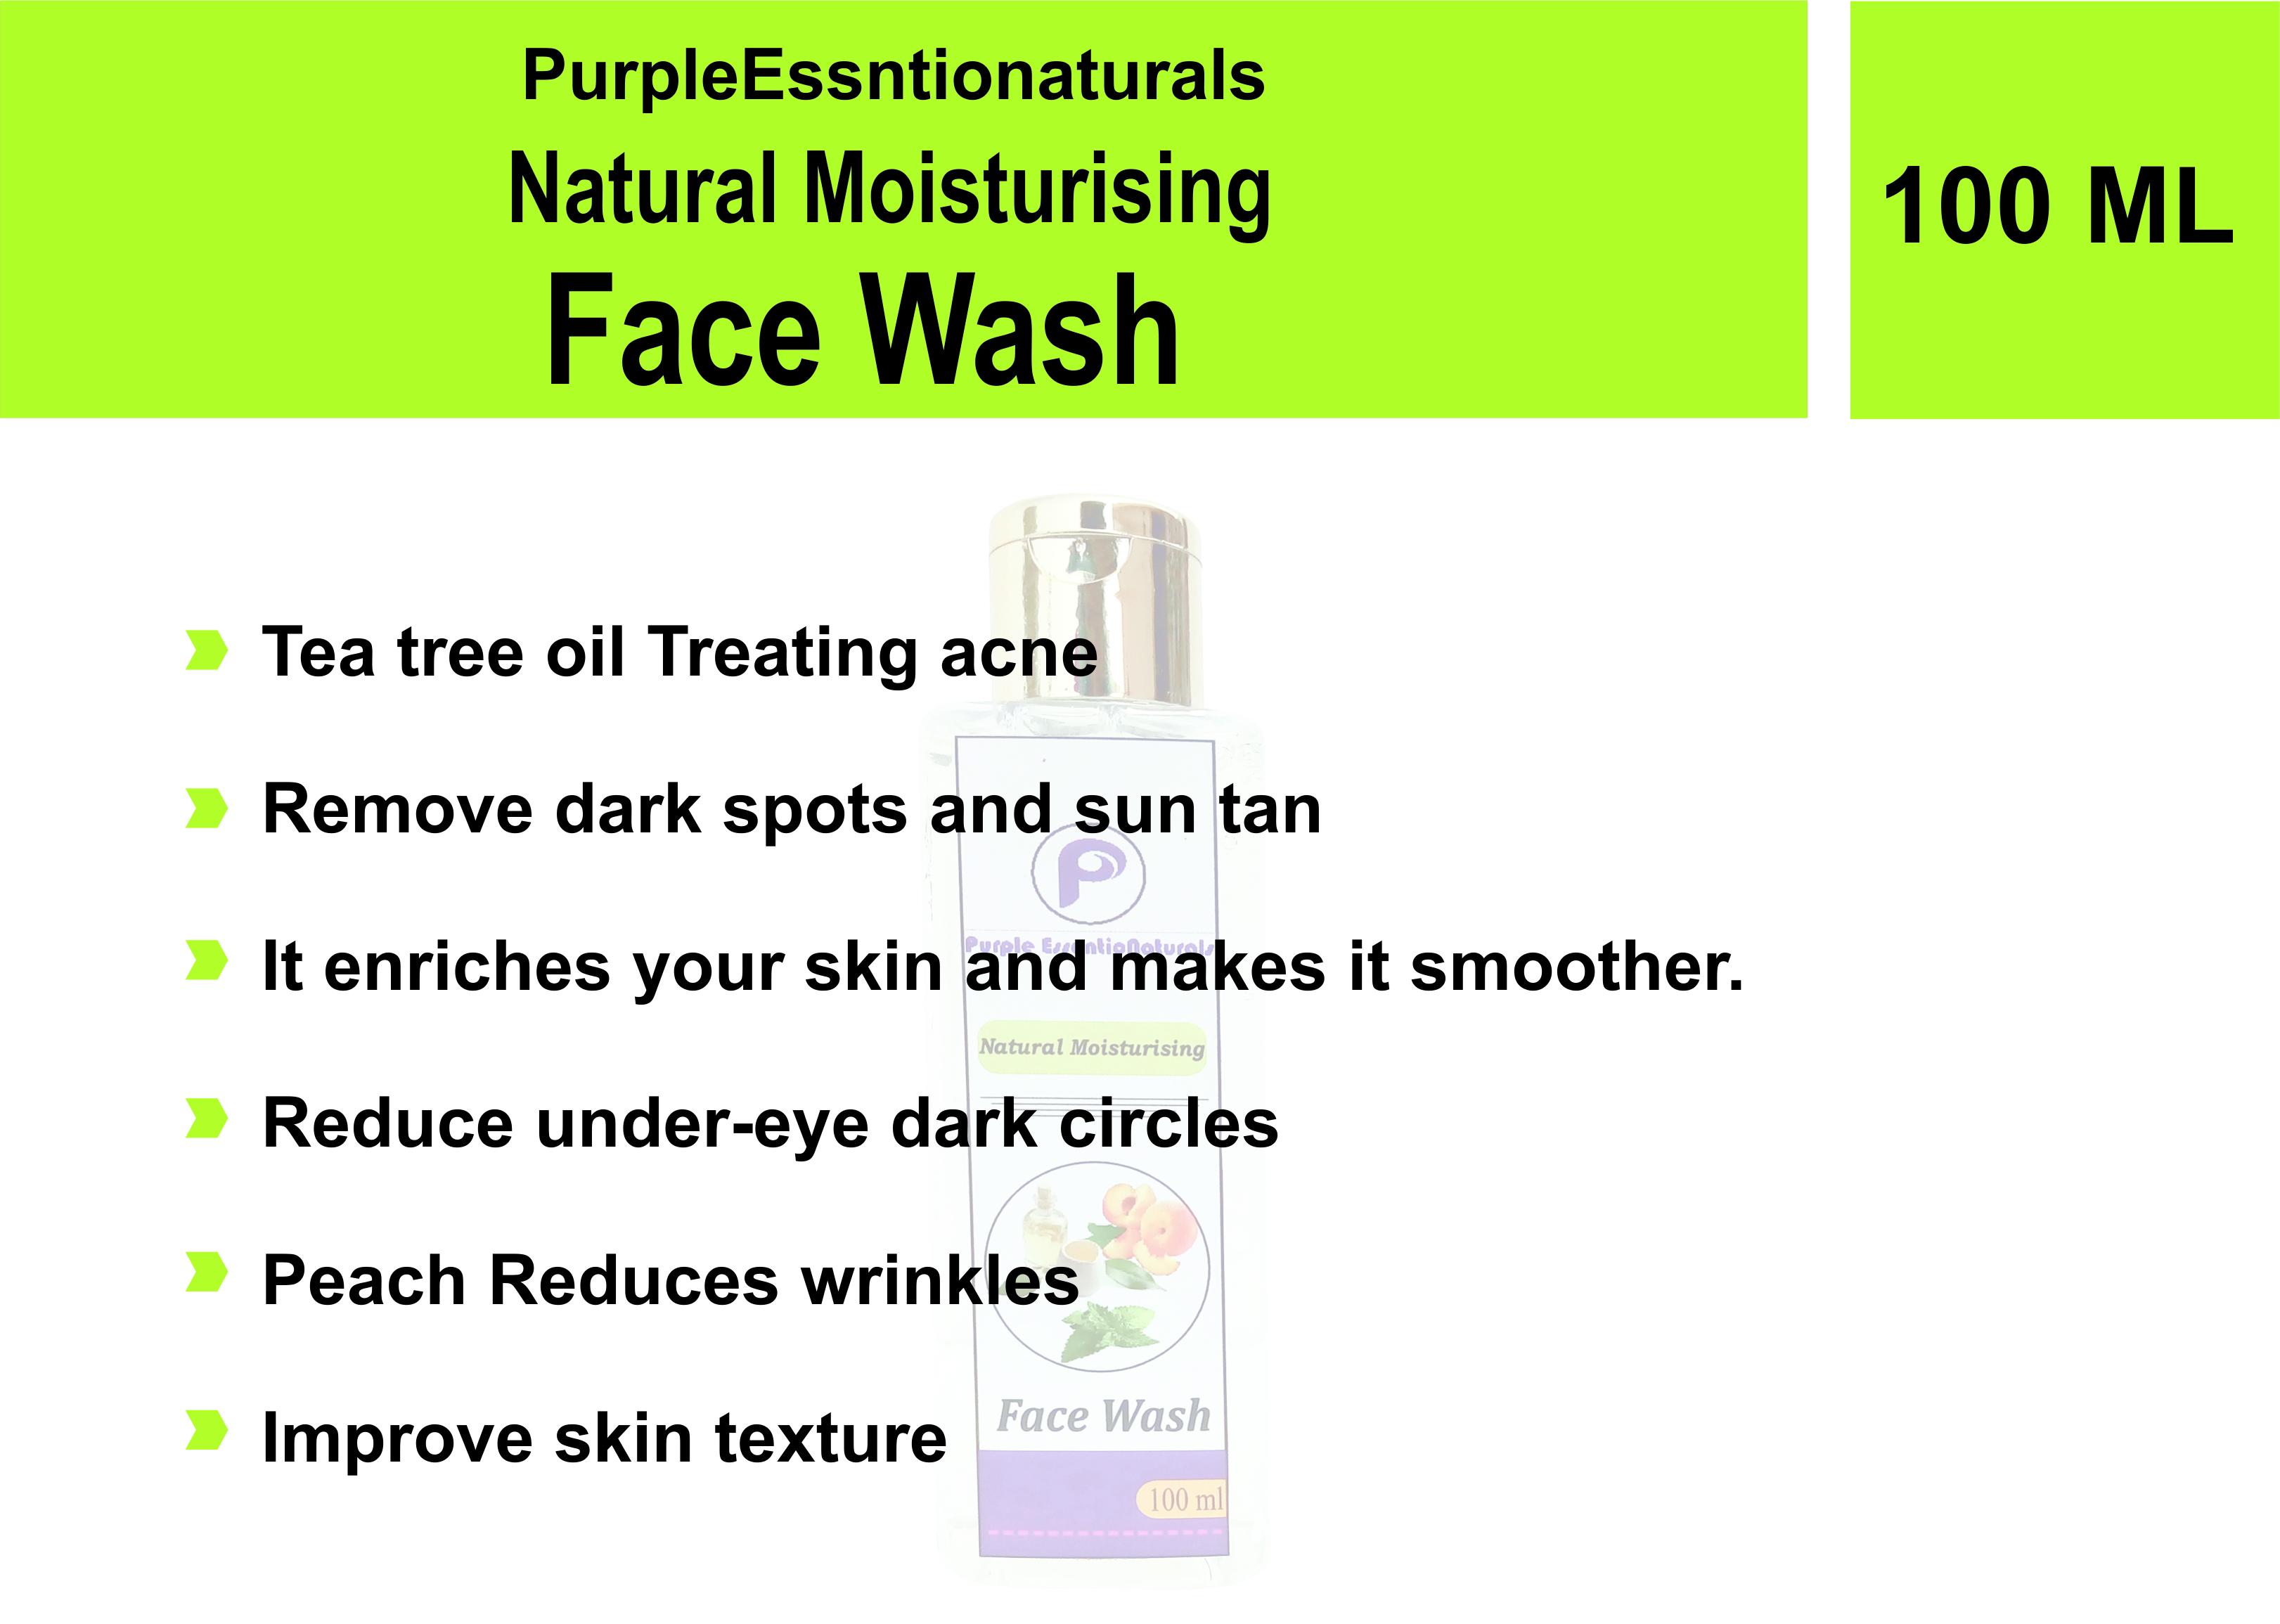 Natural Moisturizing face wash